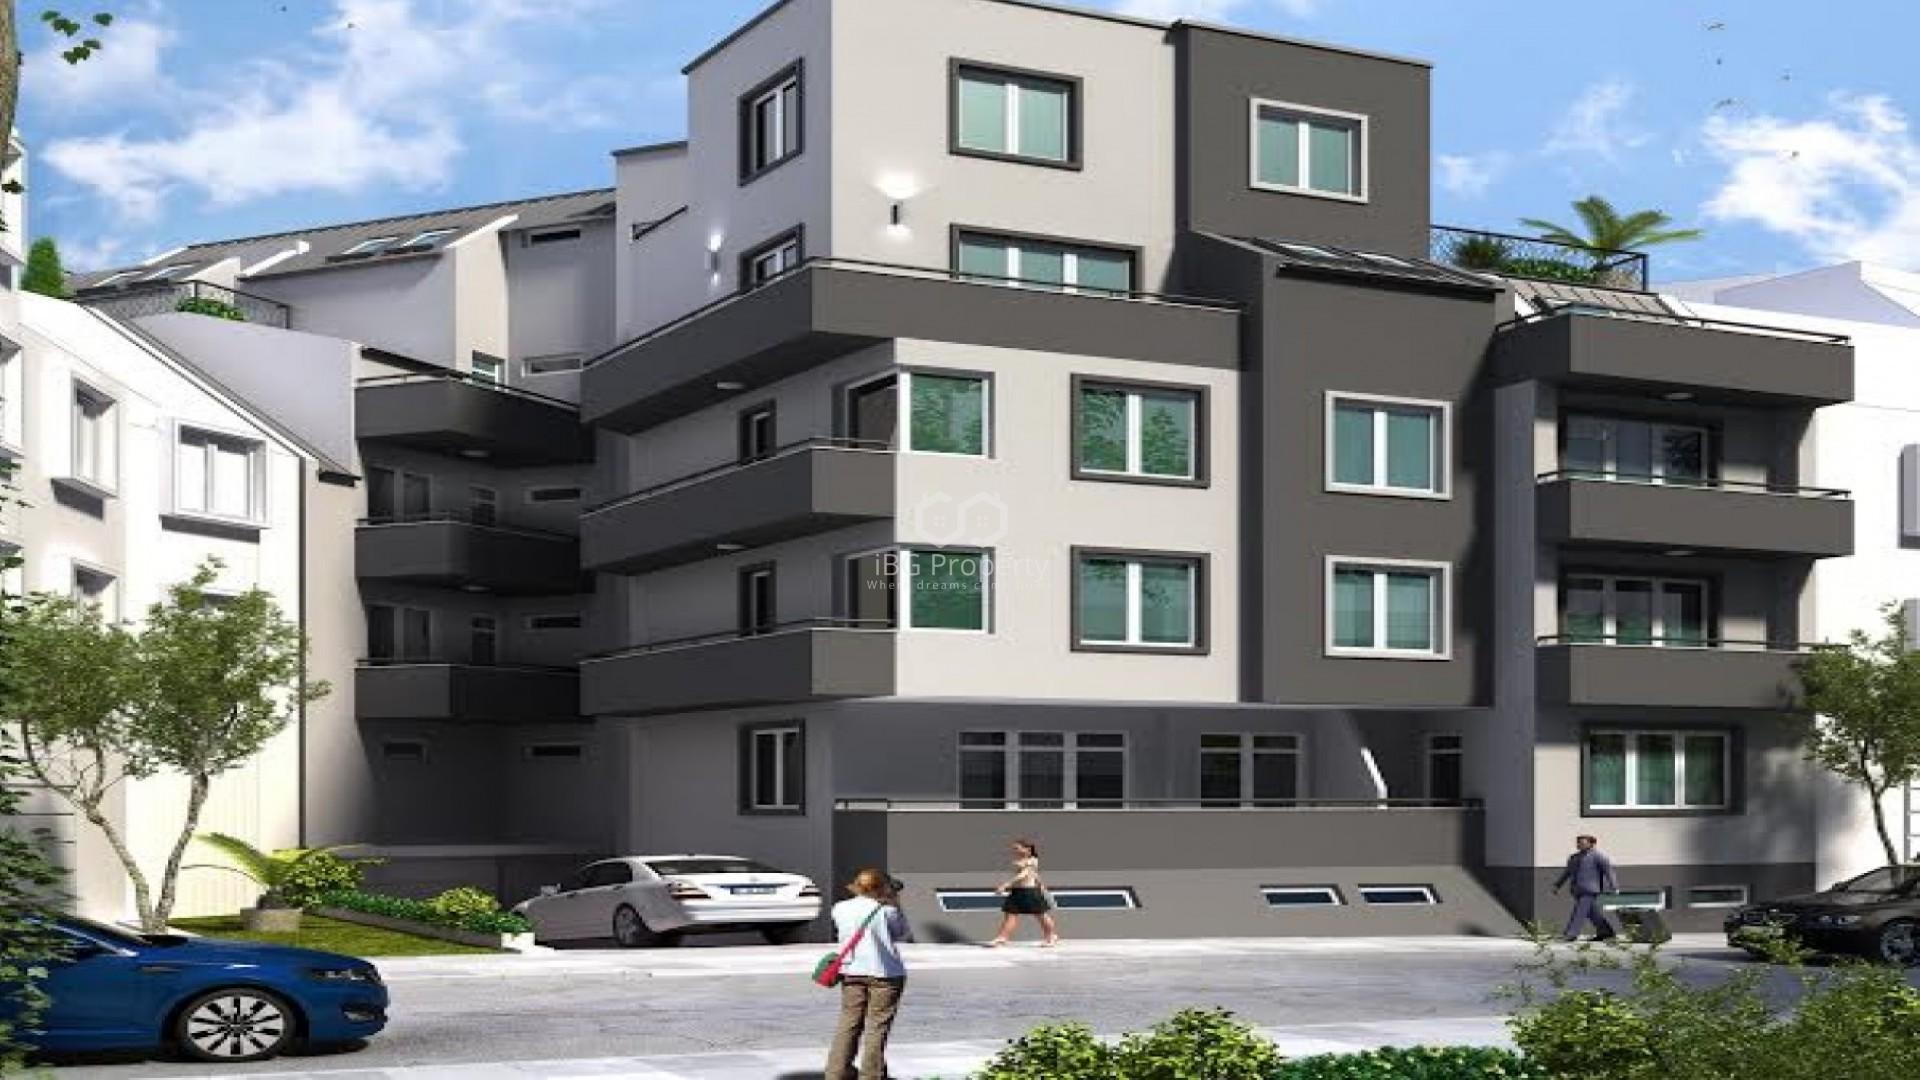 Тристаен апартамент Погреби Варна 62 m2